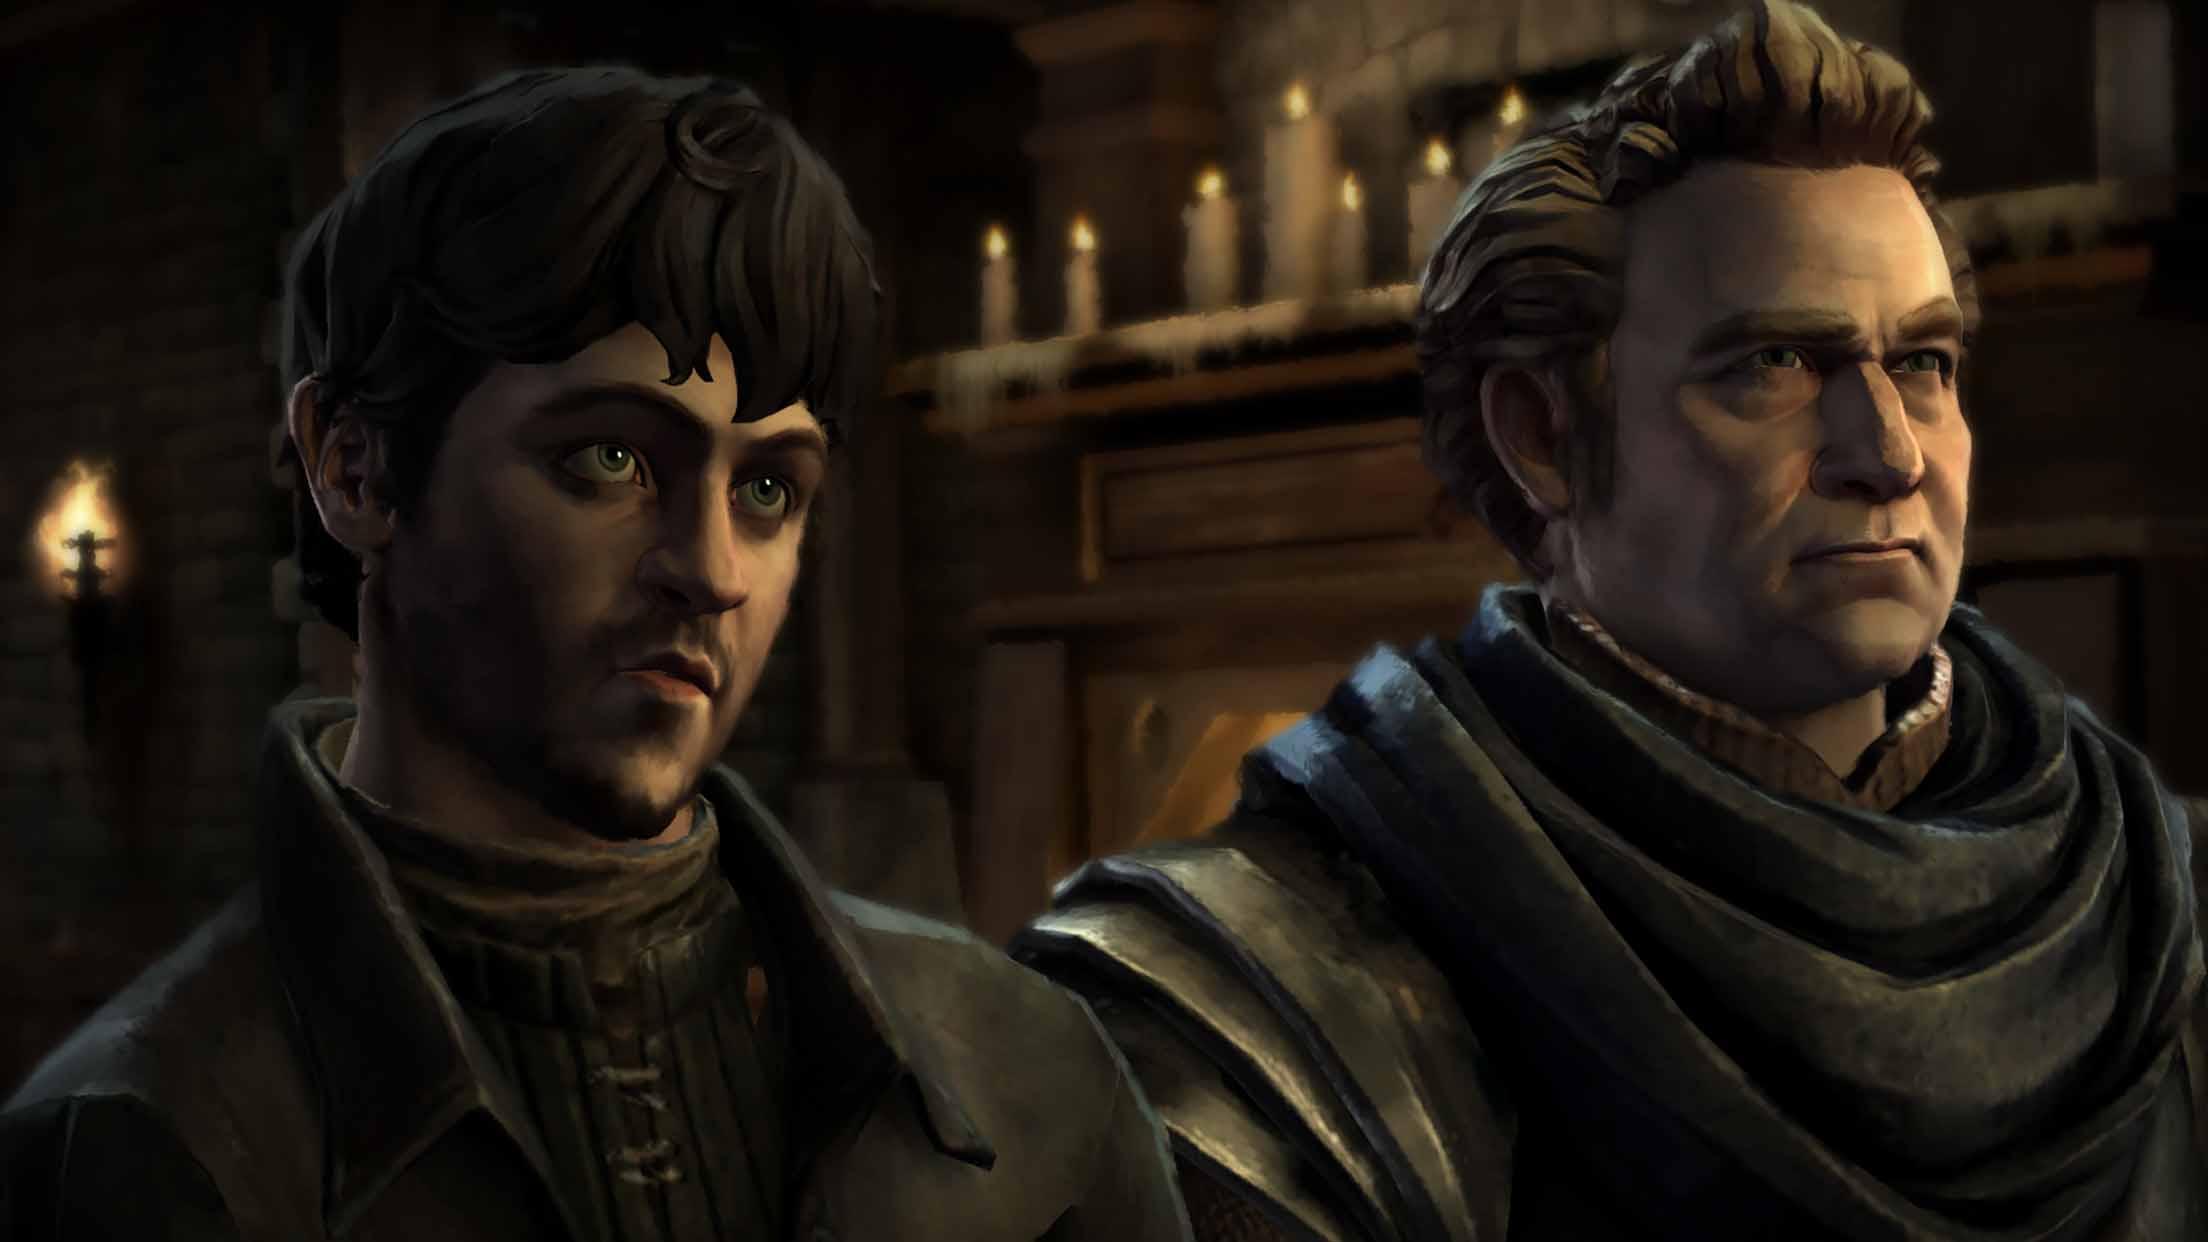 Game-of-Thrones-A-Telltale-Game-1.jpg